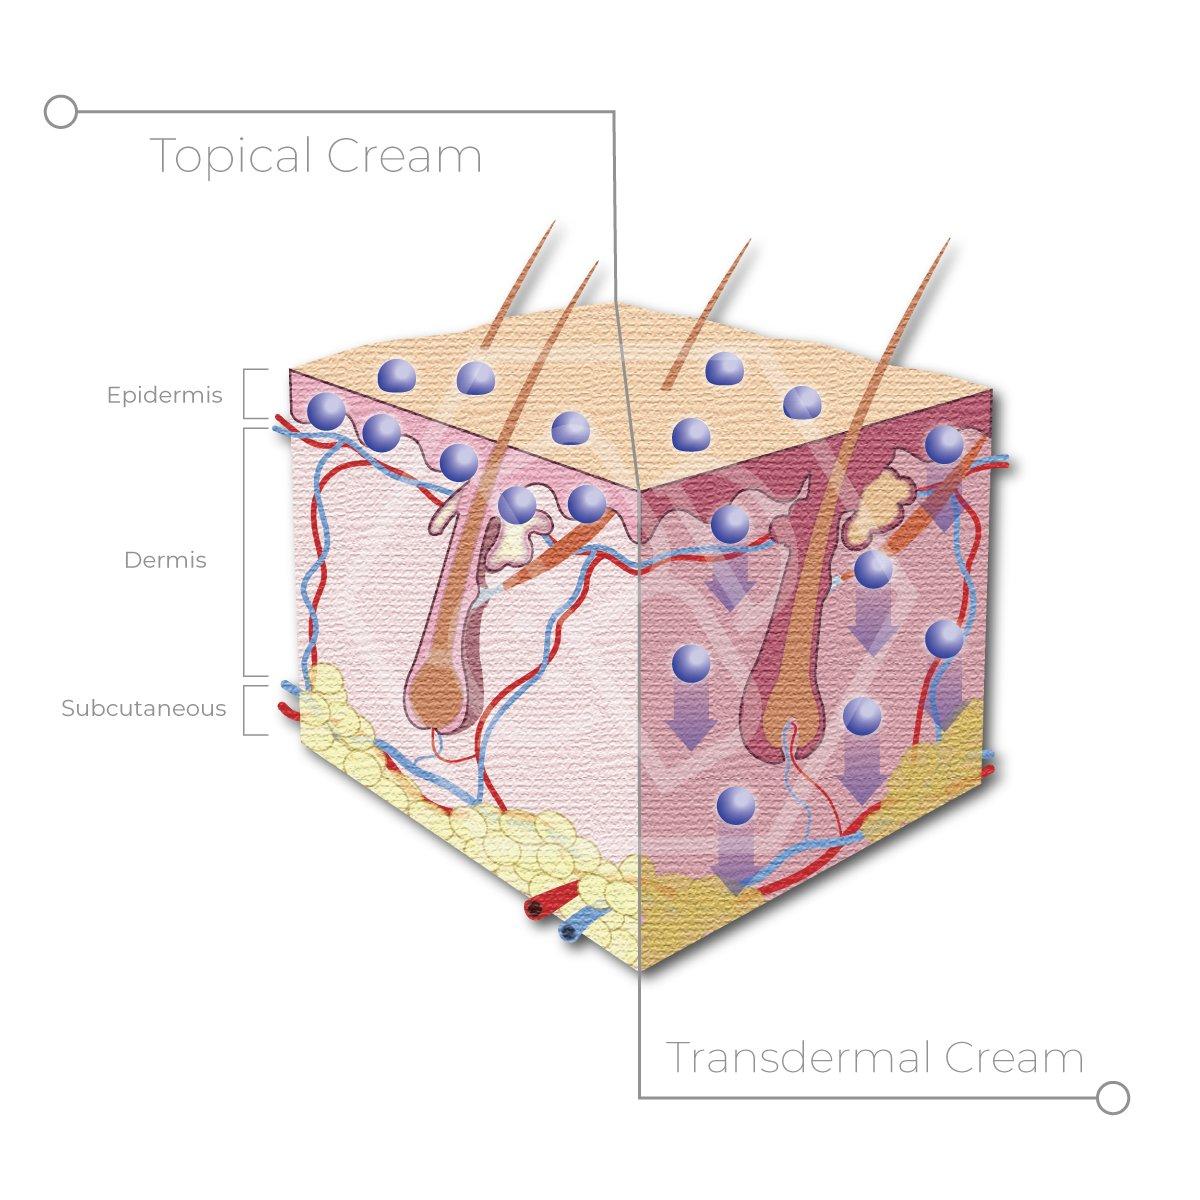 Topical Vs. Transdermal CBD Cream Effectiveness